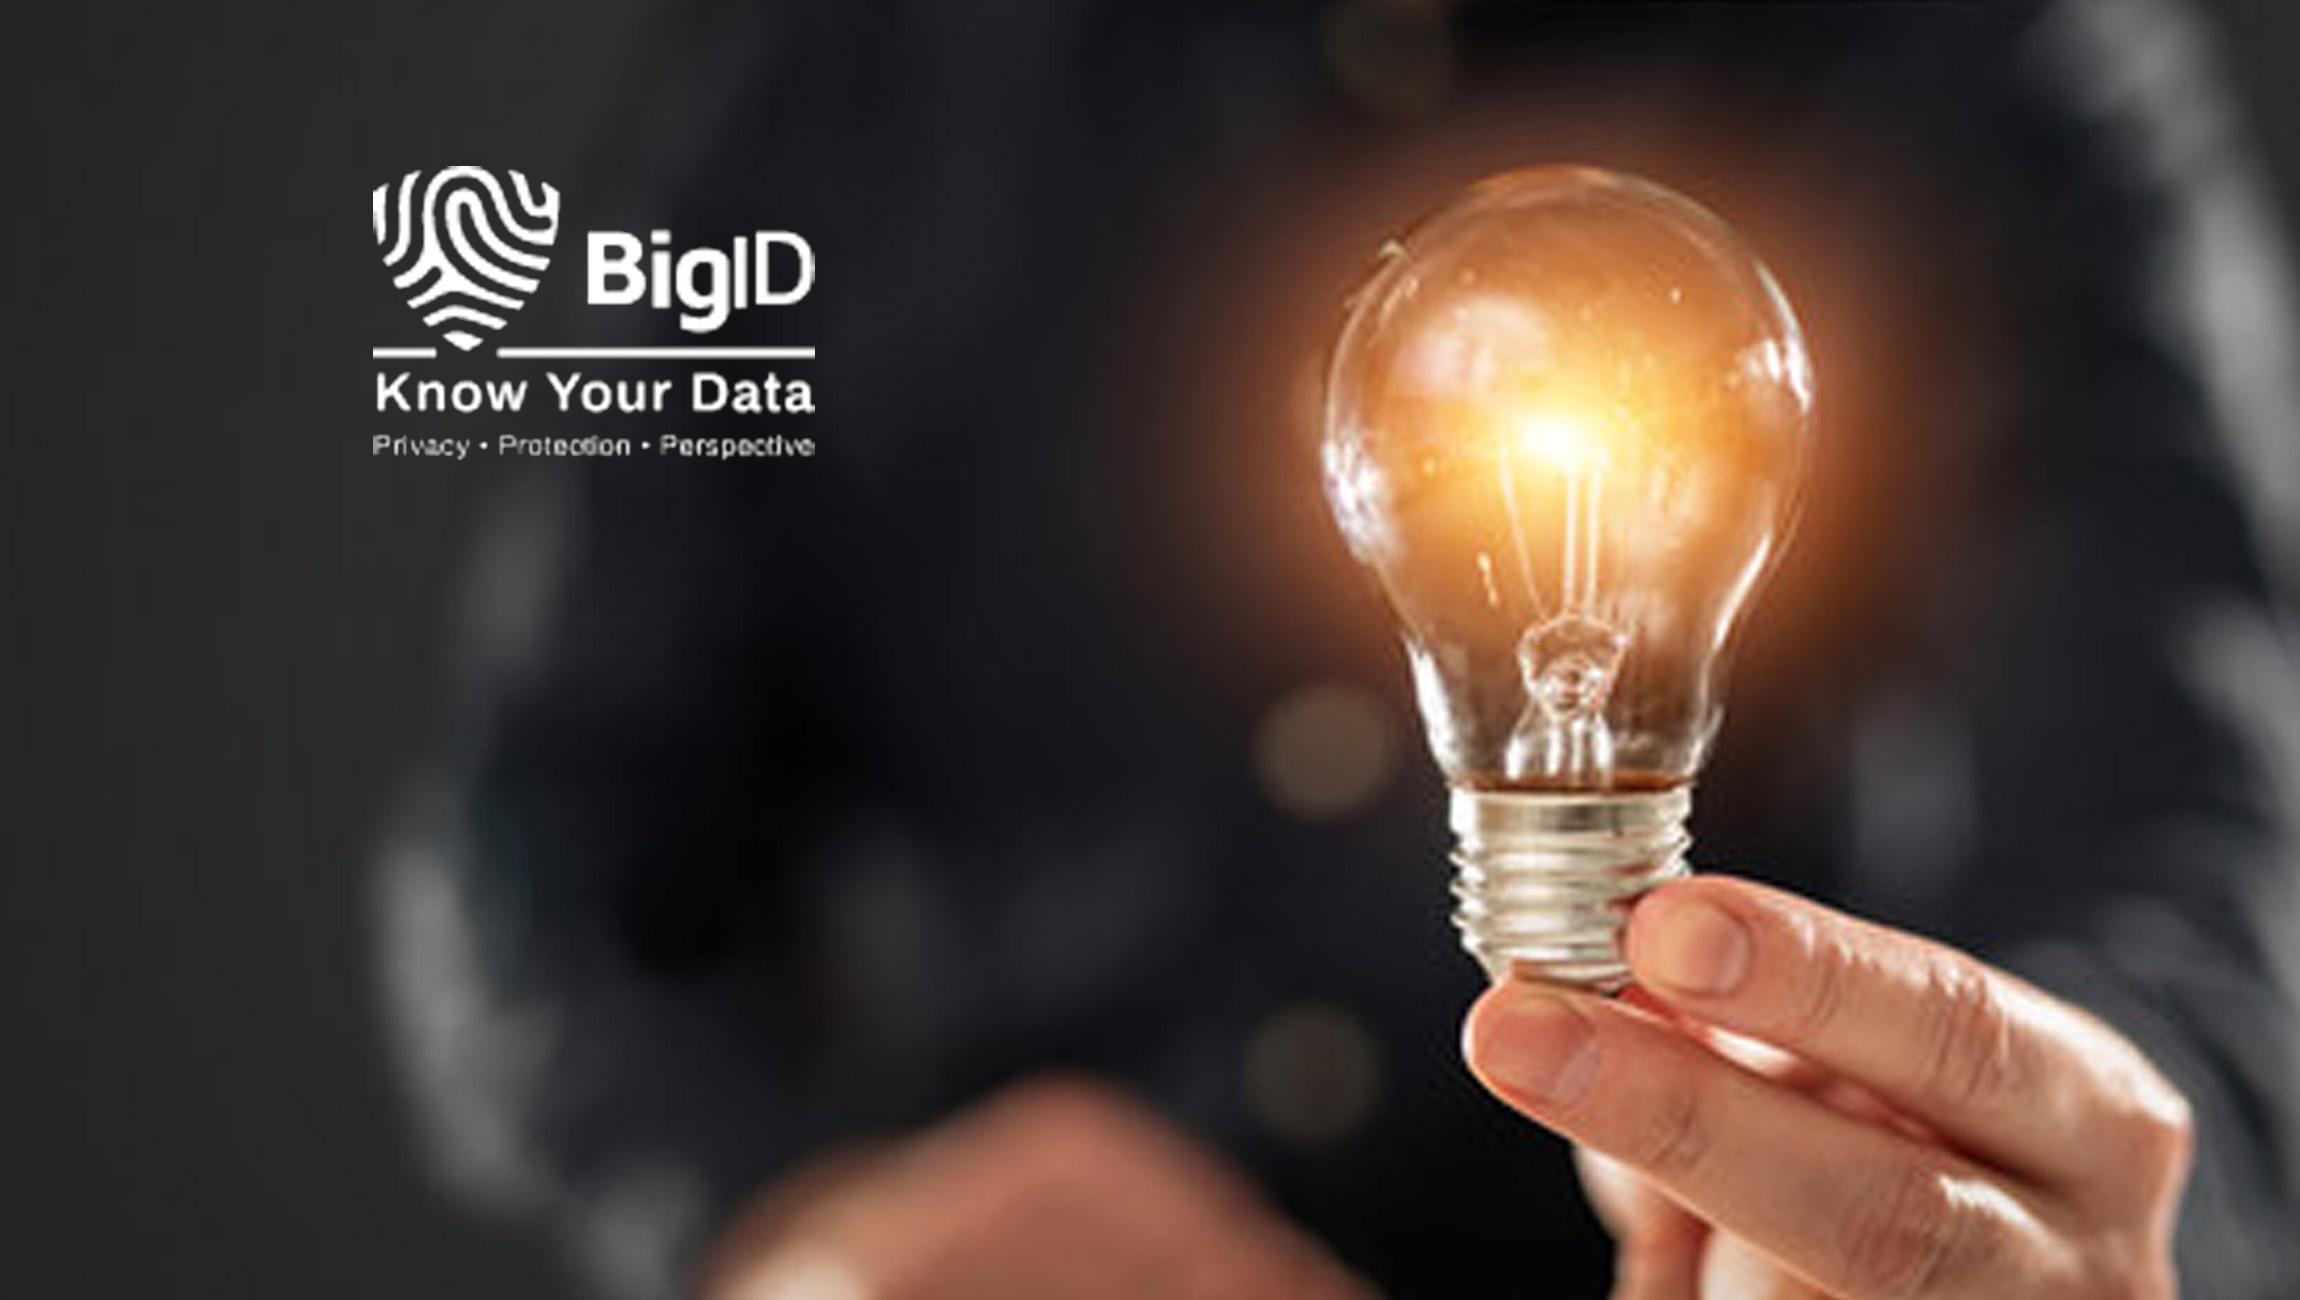 BigID Offers Big Data Leadership Training at Summer School for CDOs